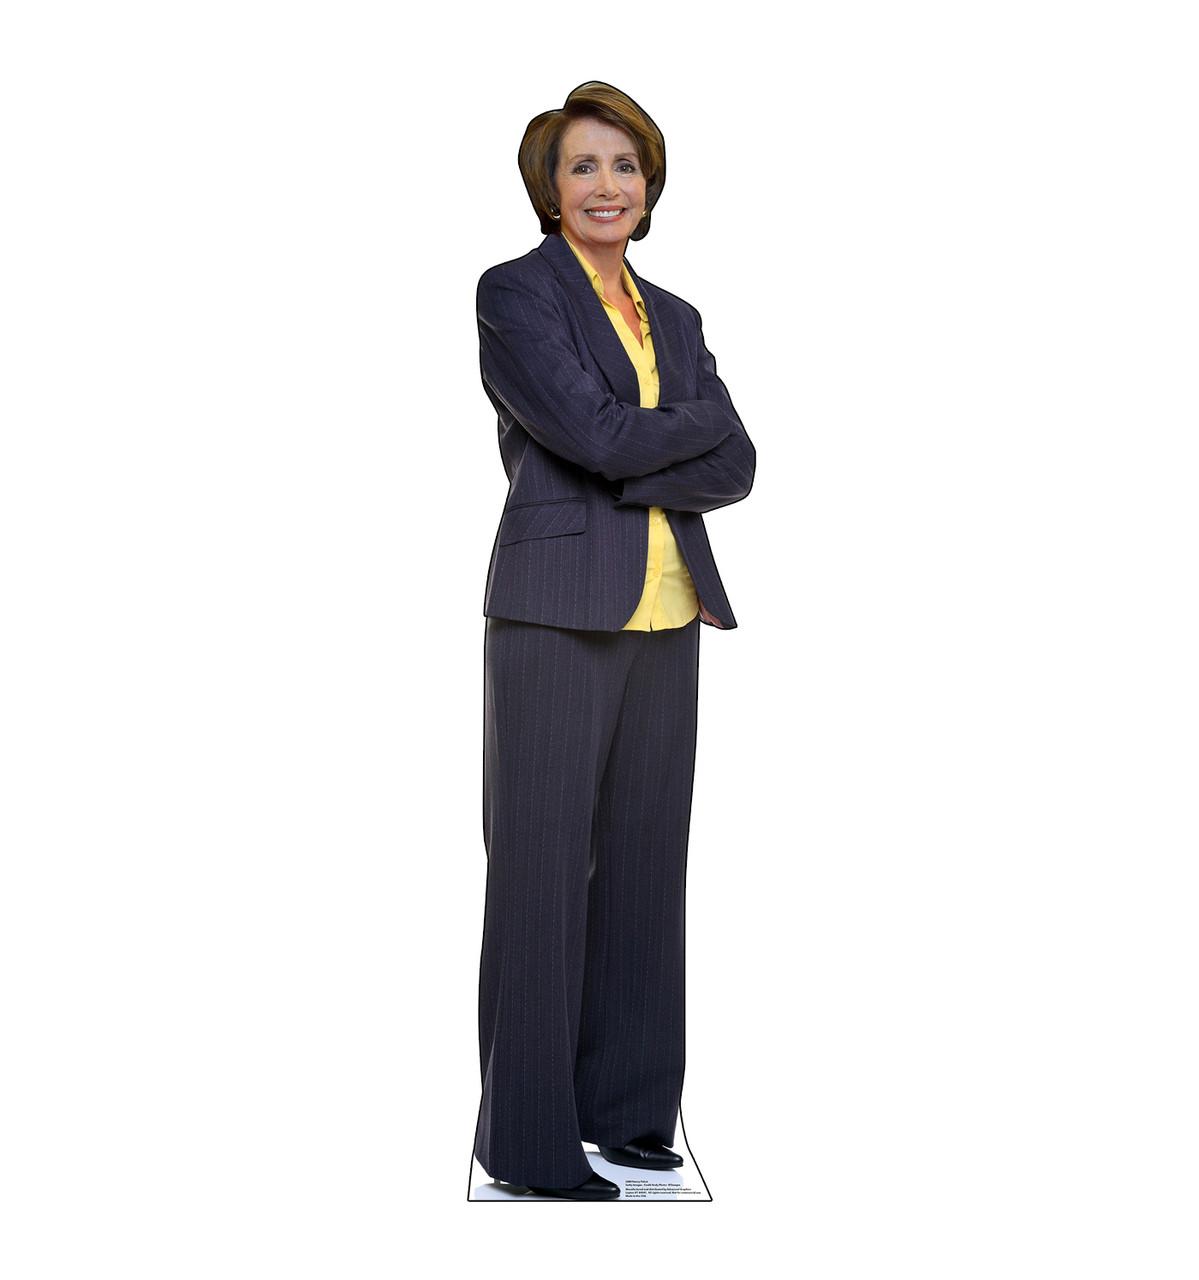 Life-size cardboard standee of Nancy Pelosi.